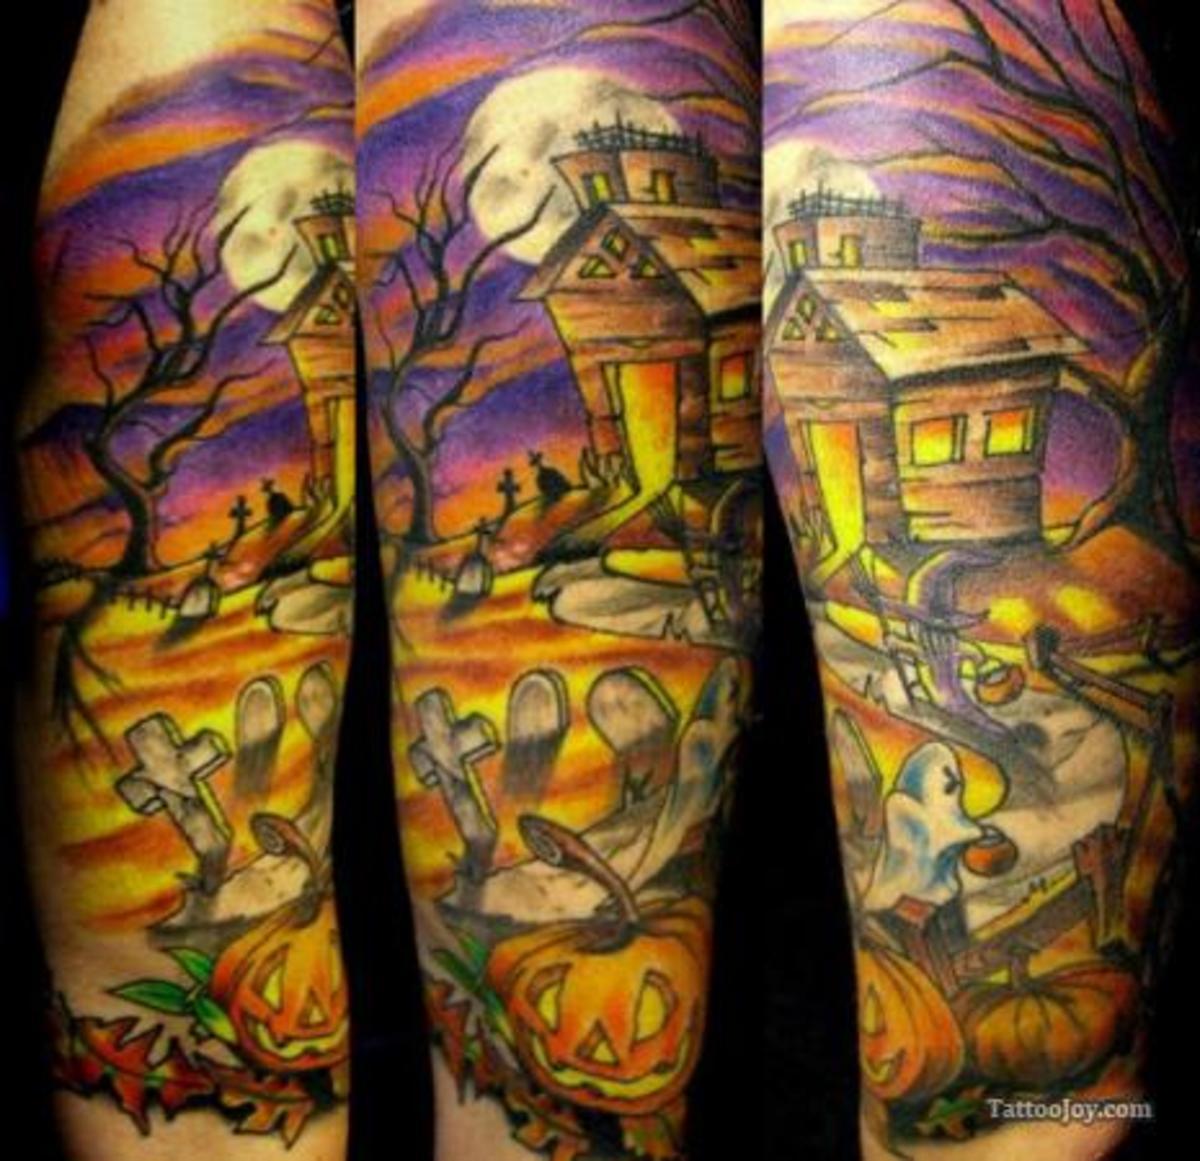 Haunted house tattoo.